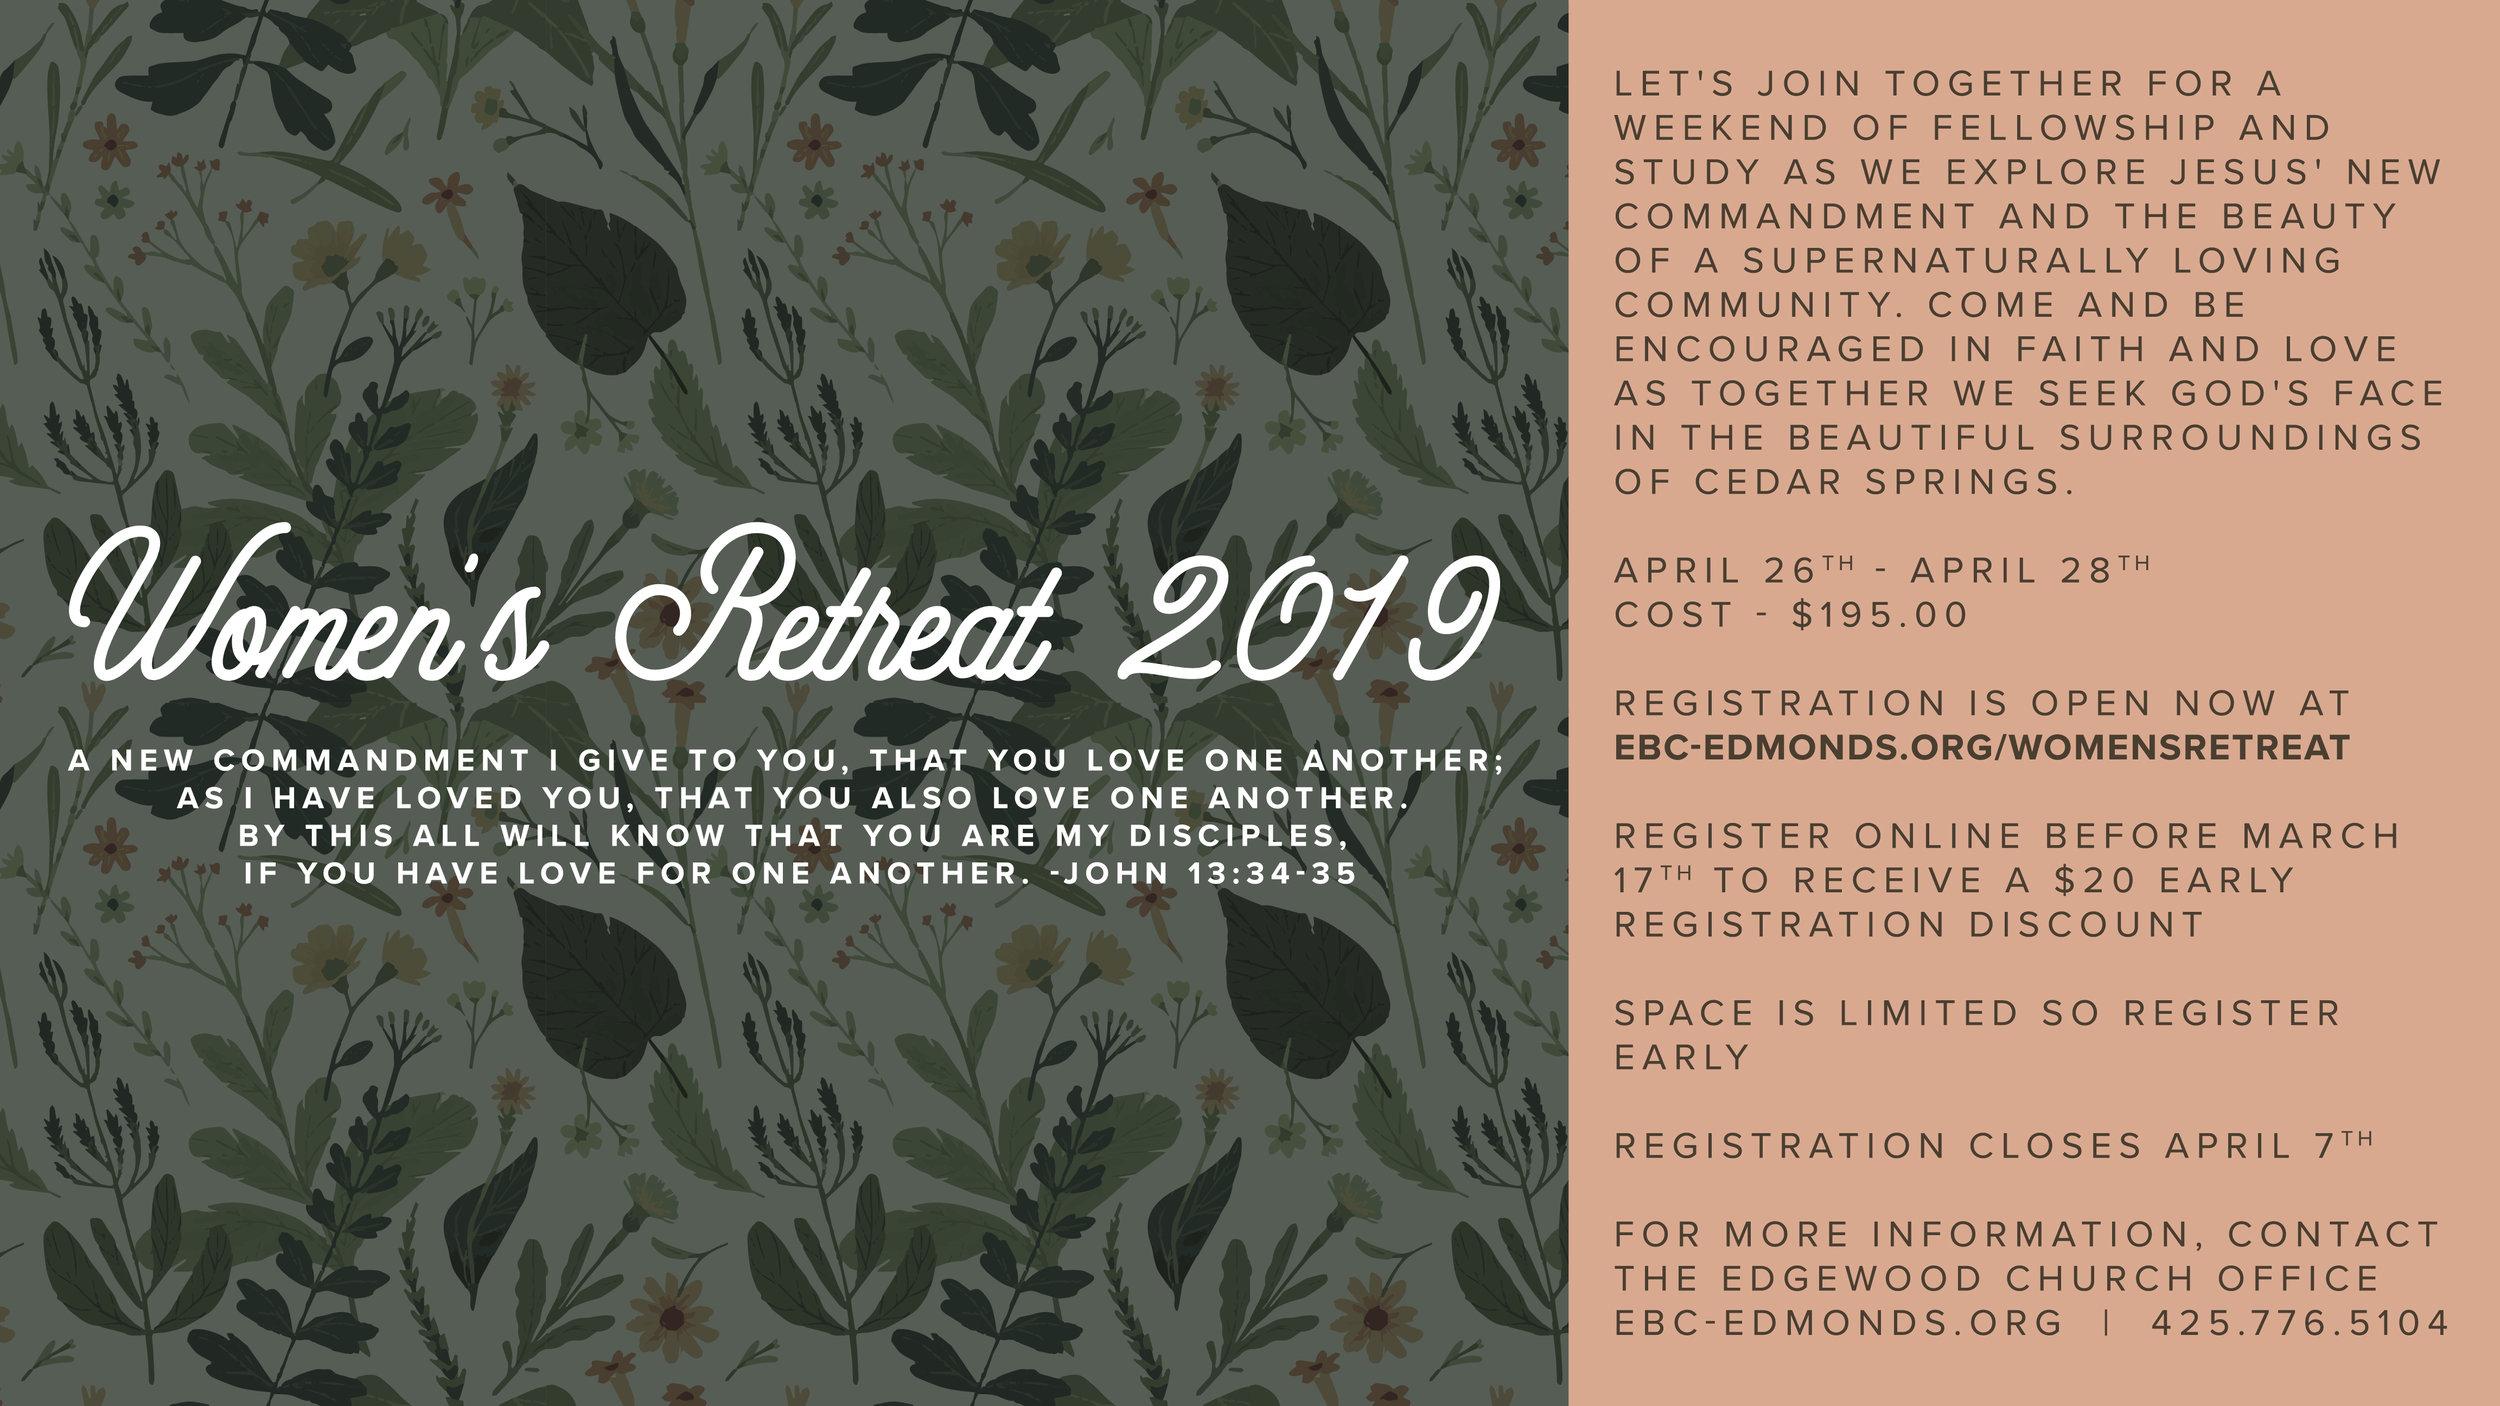 Women's Retreat 2019 - Poster.jpg